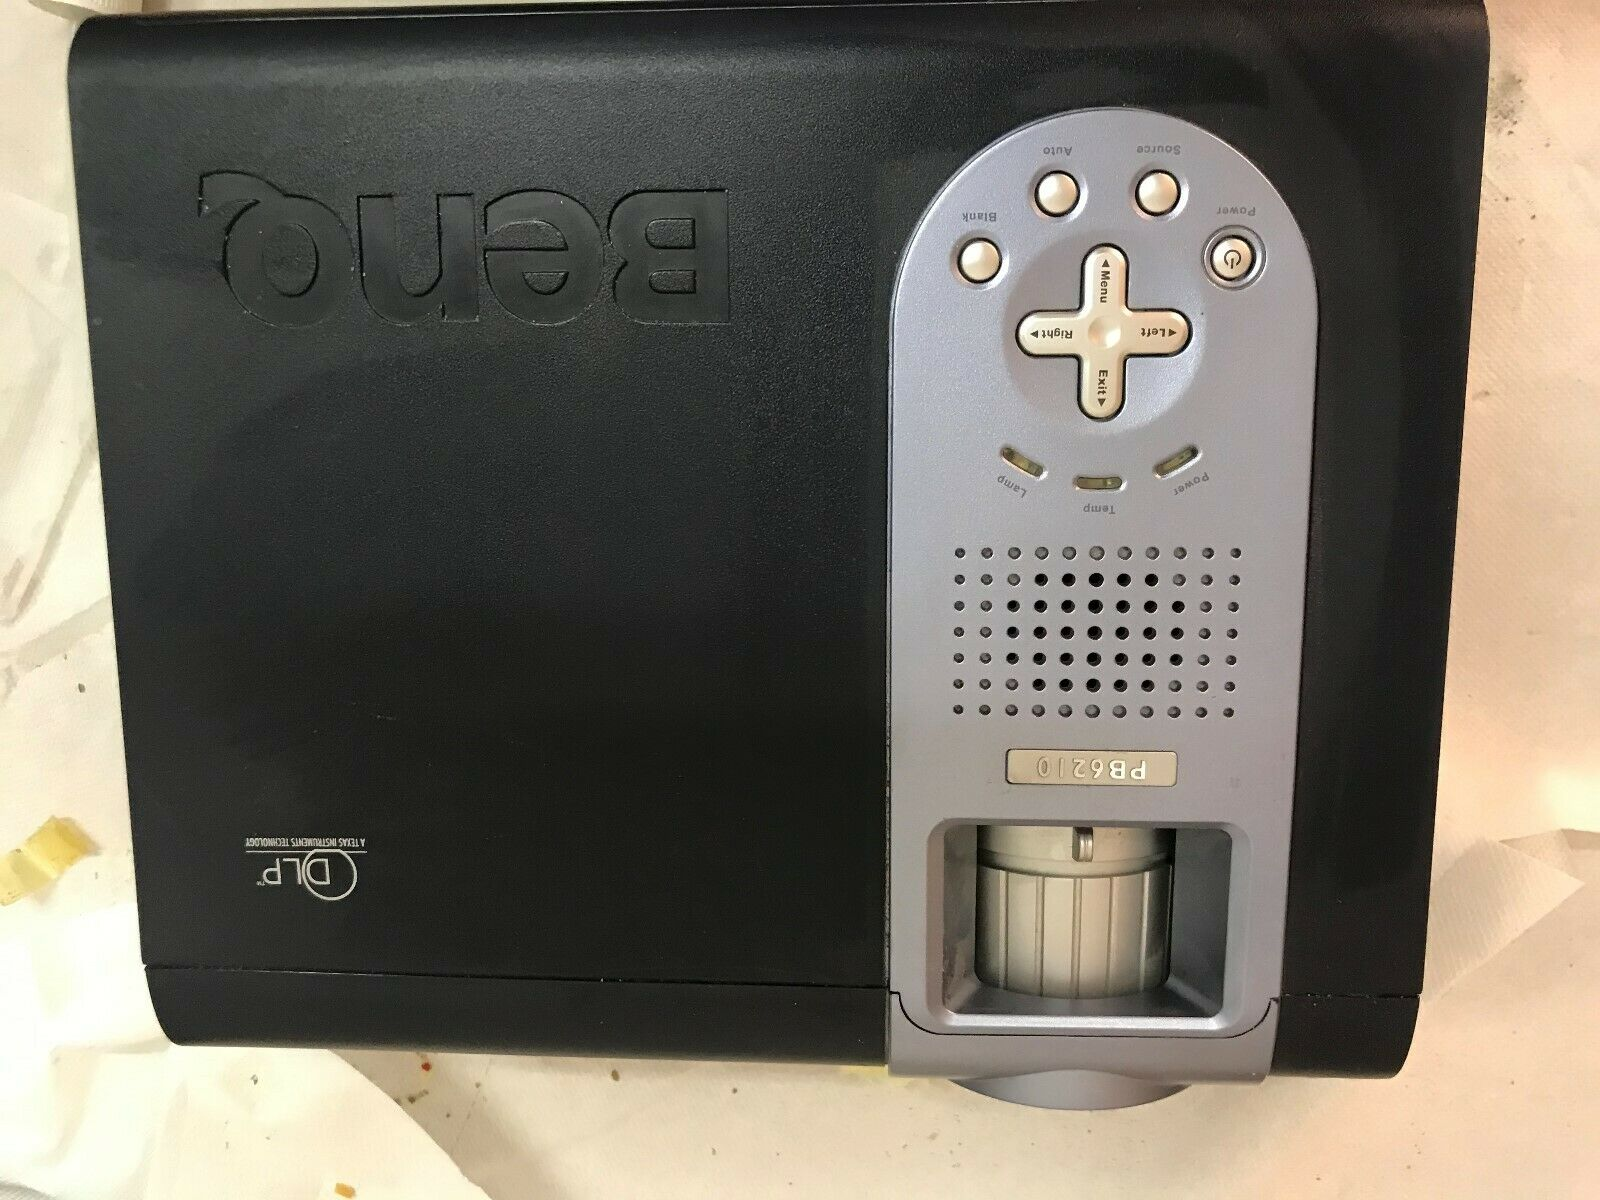 BenQ PB-6210 DLP Beamer Projektor 2000ANSI/LU gebraucht,Bild sehr gut